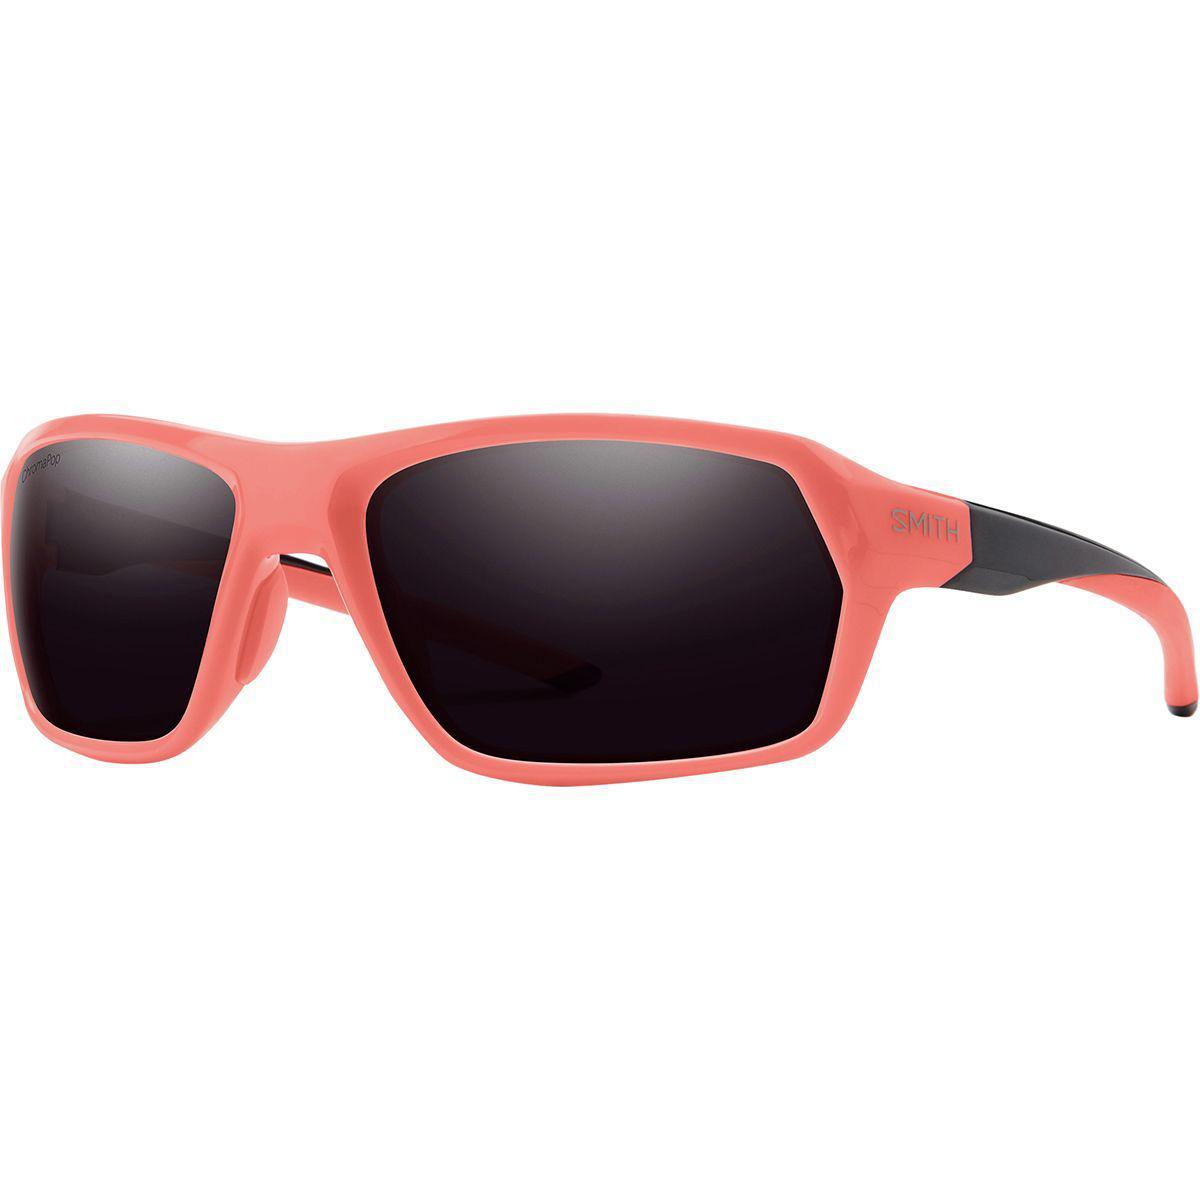 97d45d51bab Lyst - Smith Rebound Chromapop Sunglasses in Black for Men